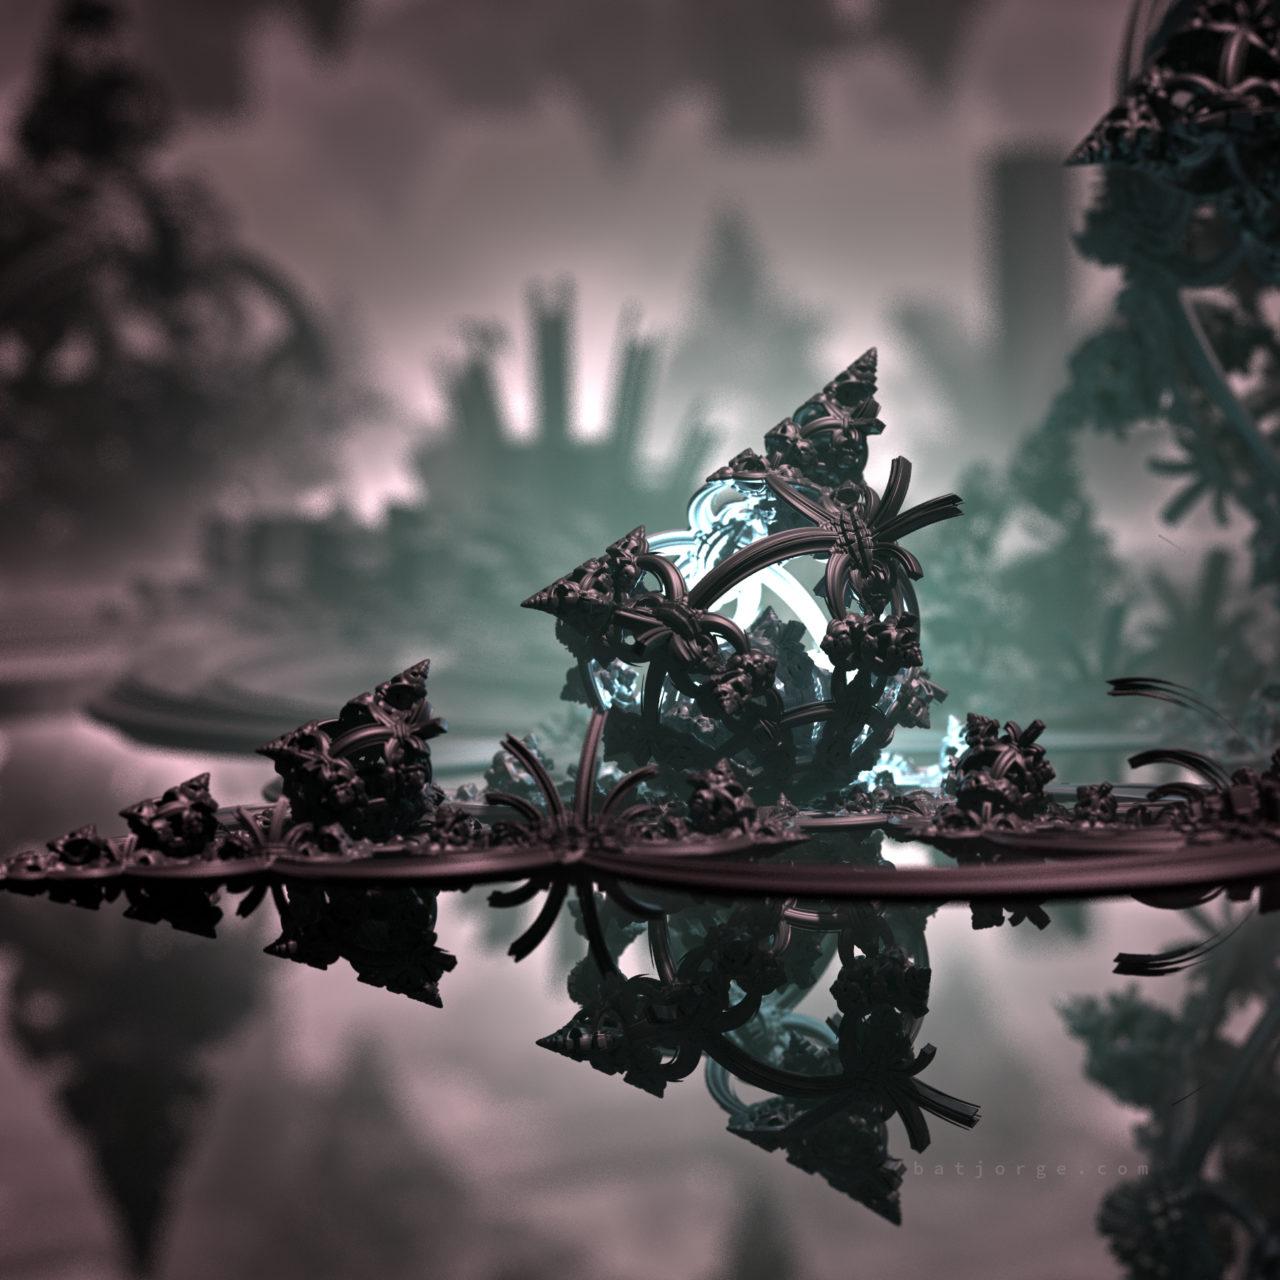 Mandelbulber fractal Mandalay-Mandelbox